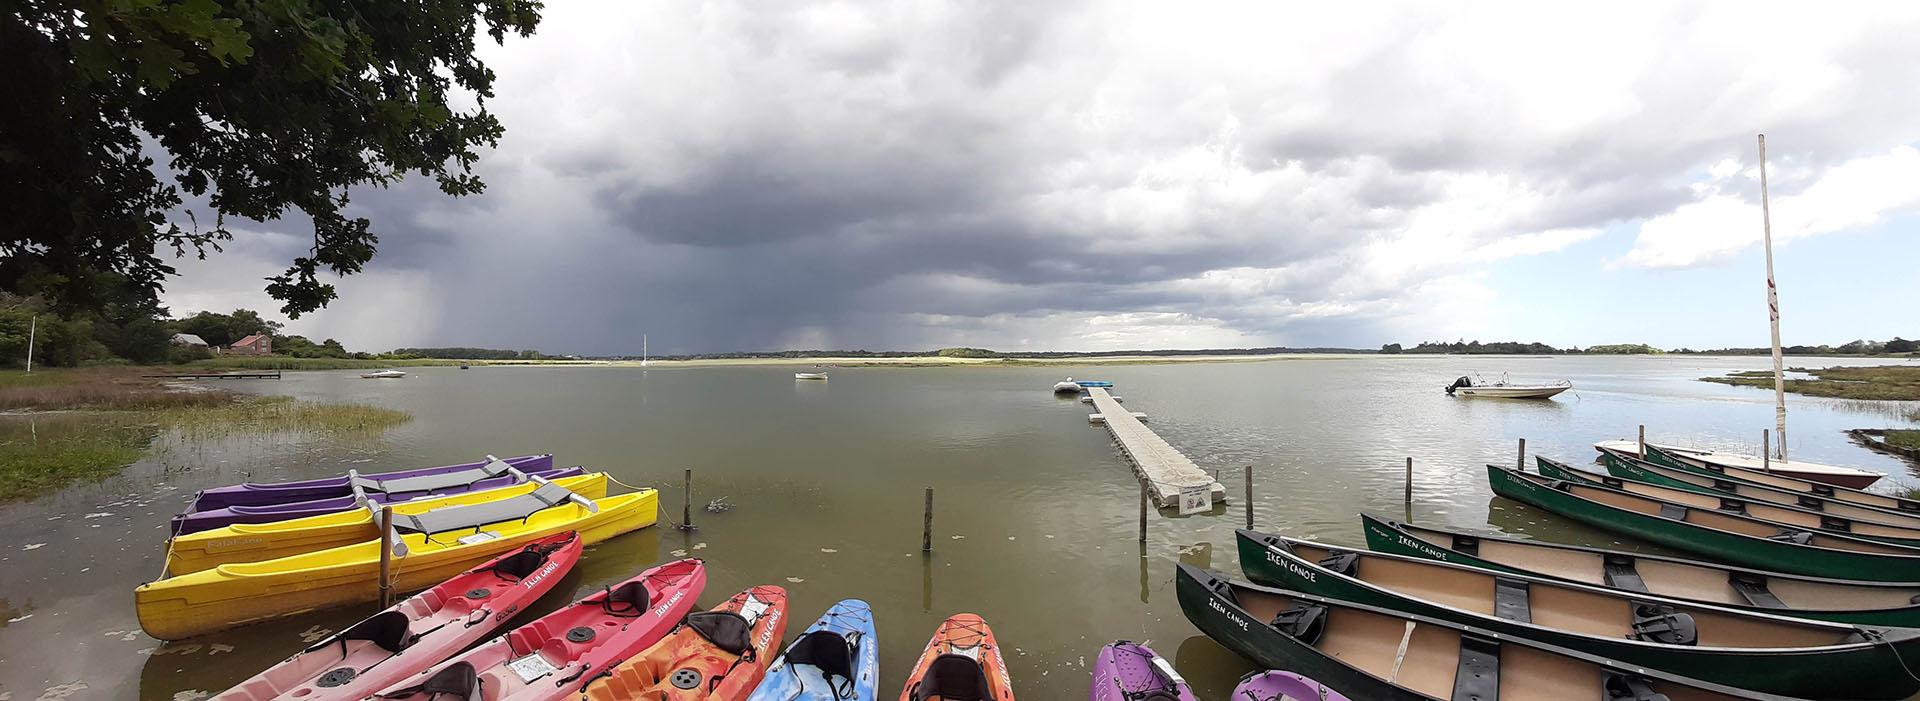 Iken Canoe's main image